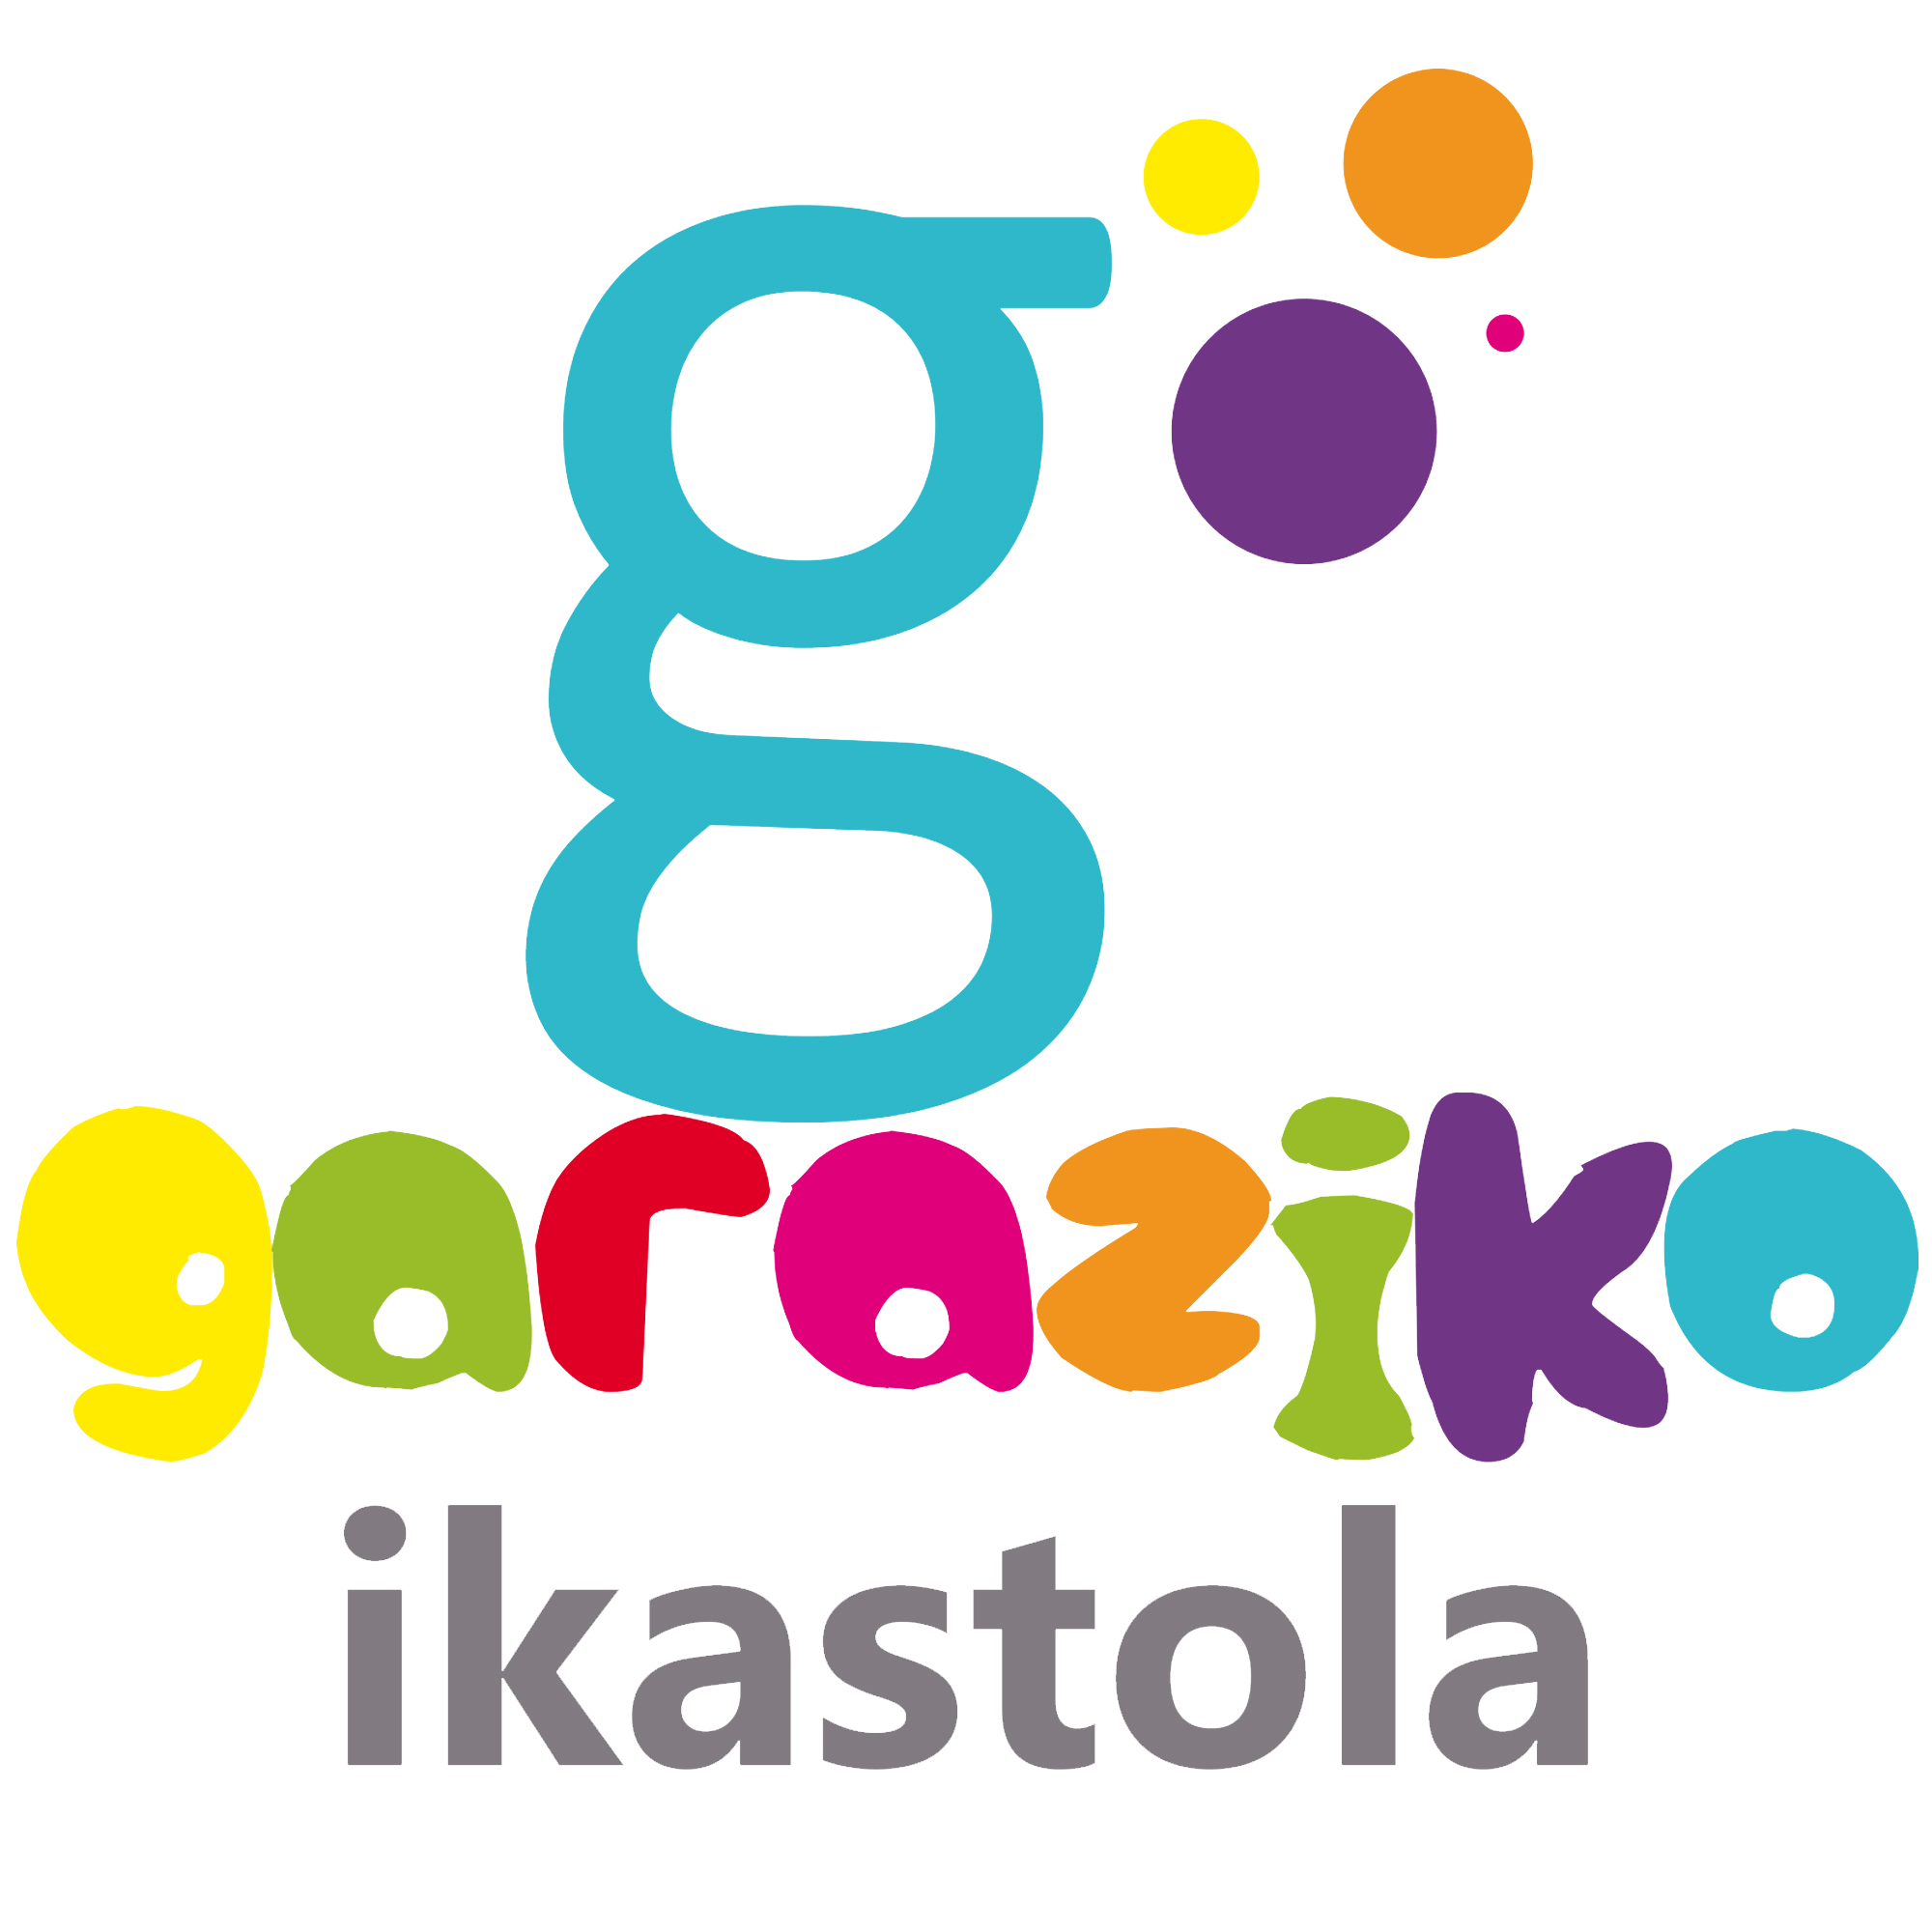 Garaziko Ikastola